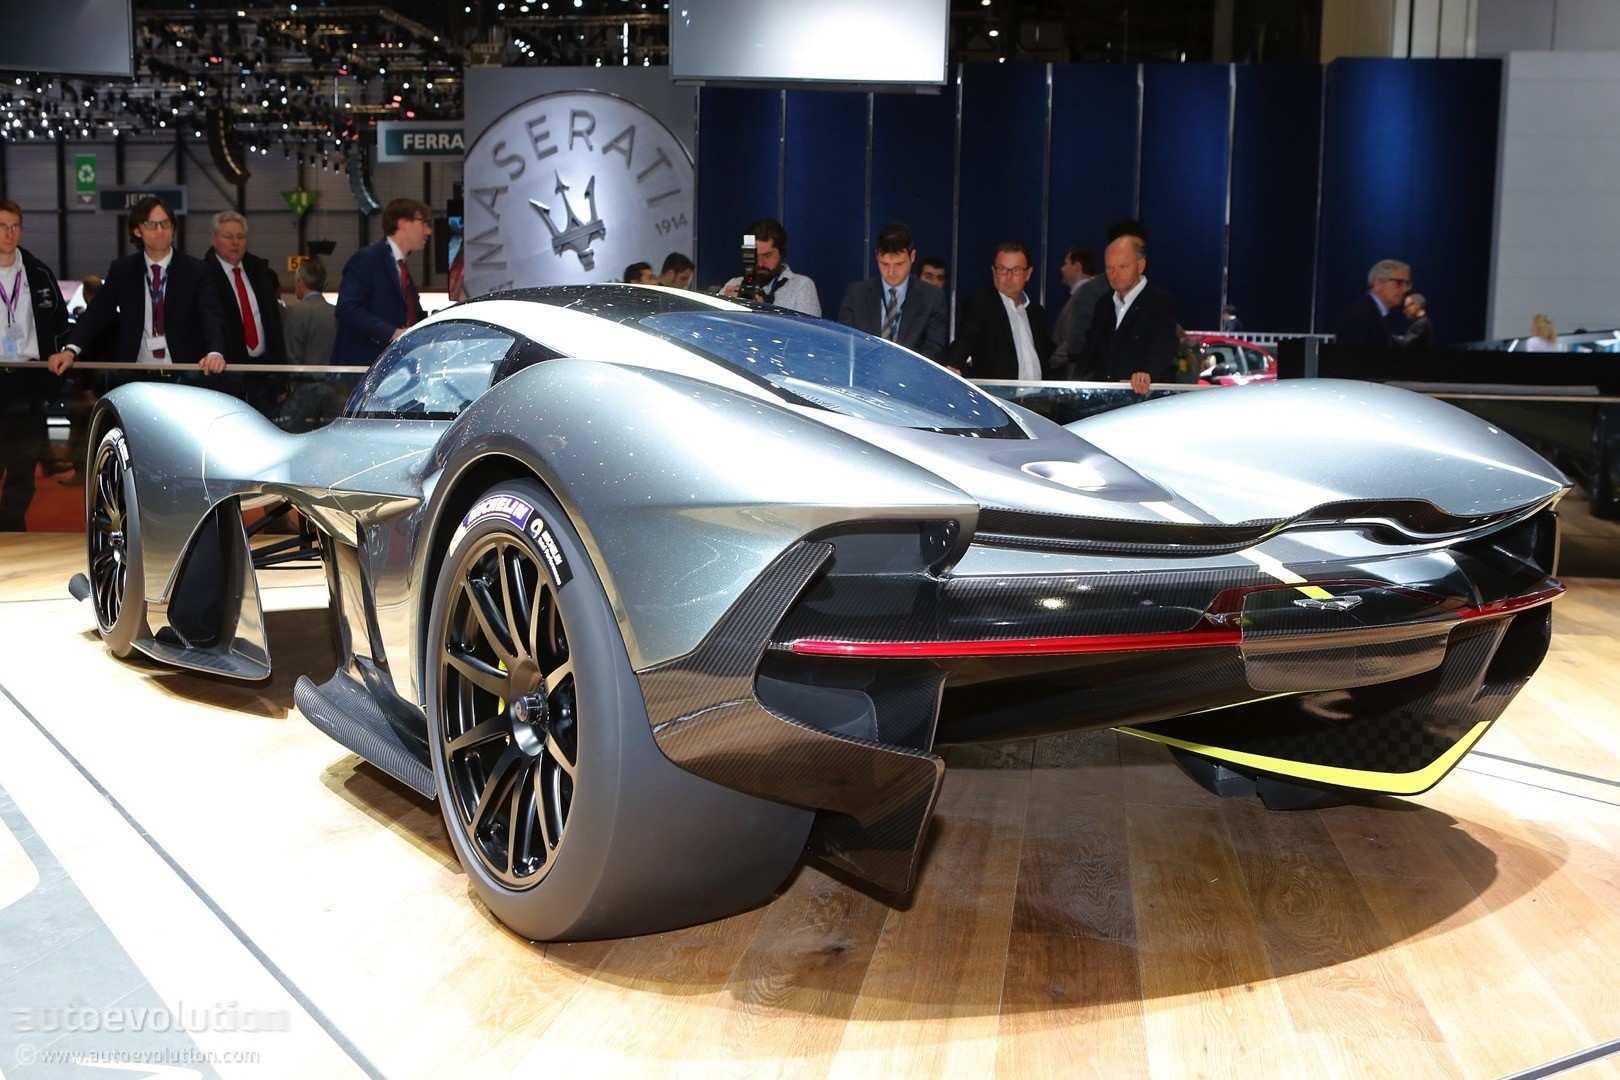 98 Gallery of 2020 Aston Martin Valkyrie Price for 2020 Aston Martin Valkyrie